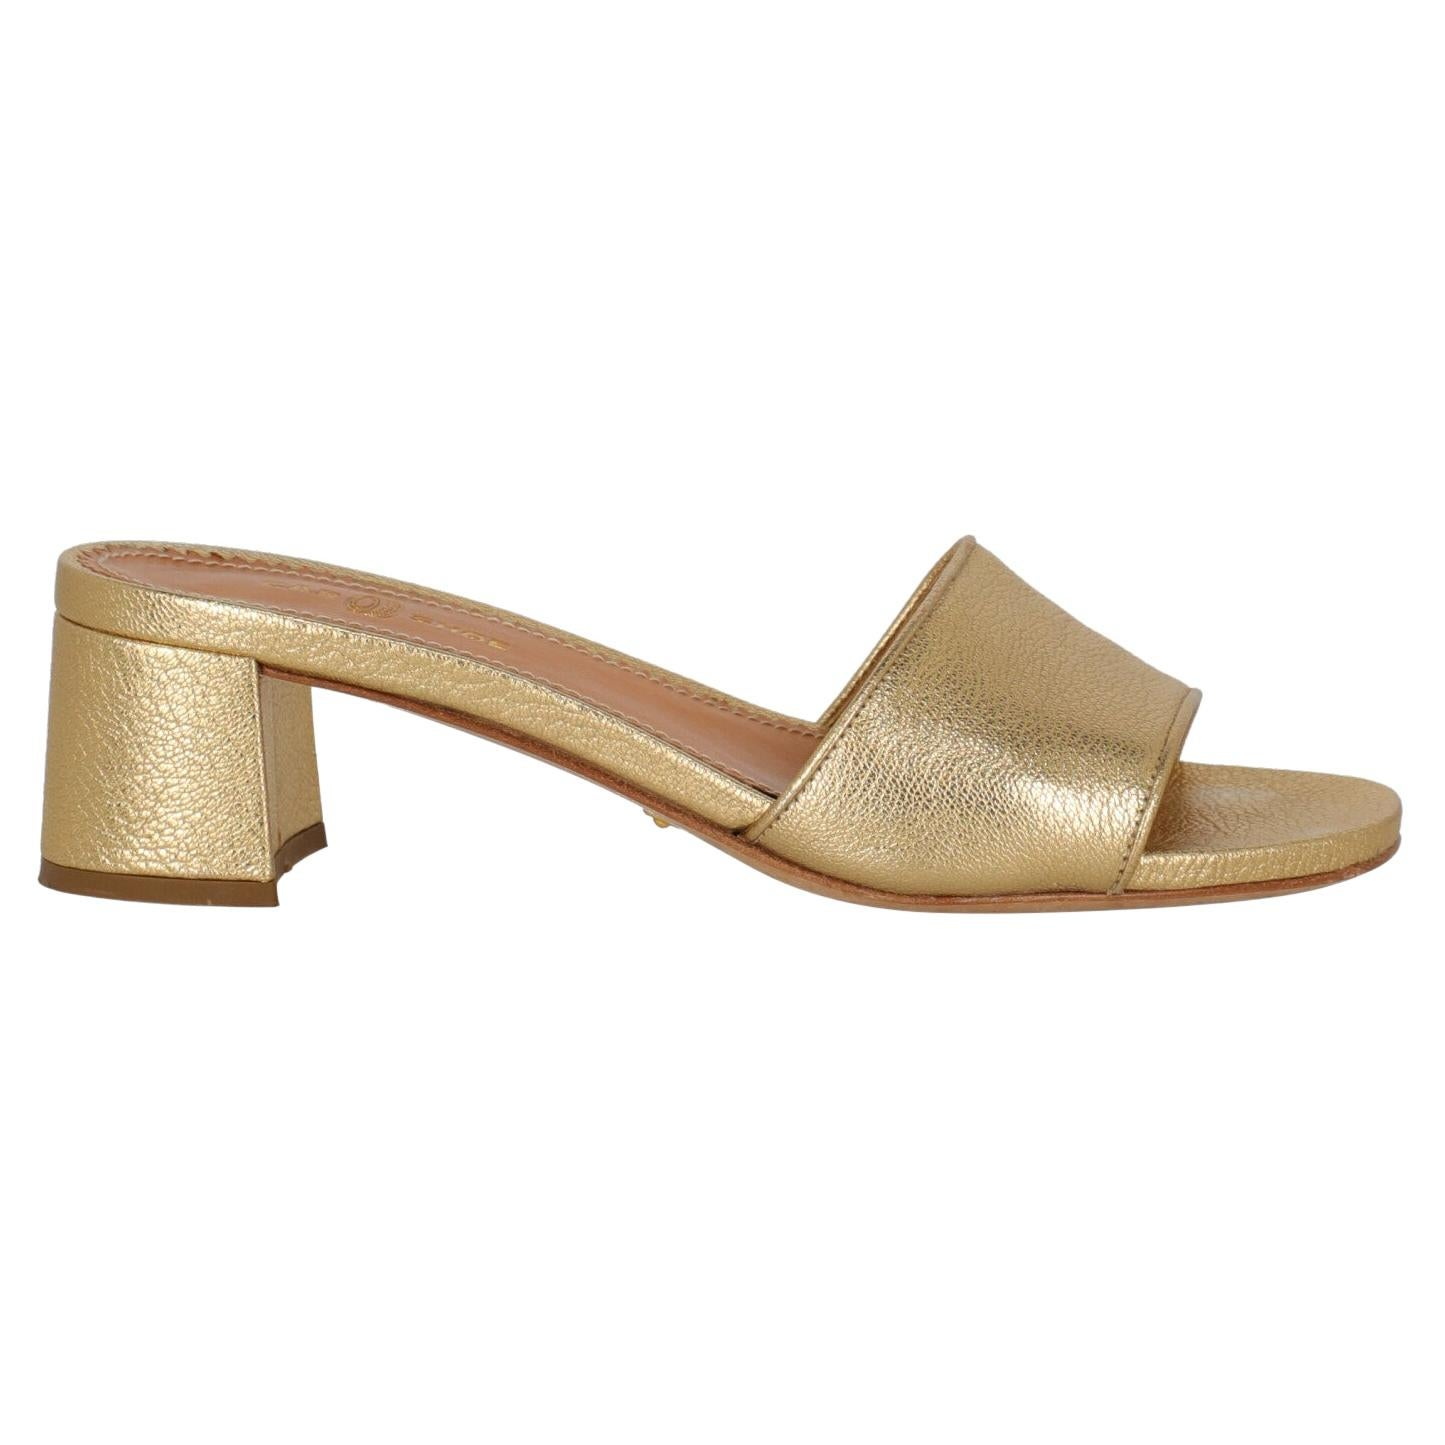 Car Shoe  Women   Sandals  Gold Leather EU 37